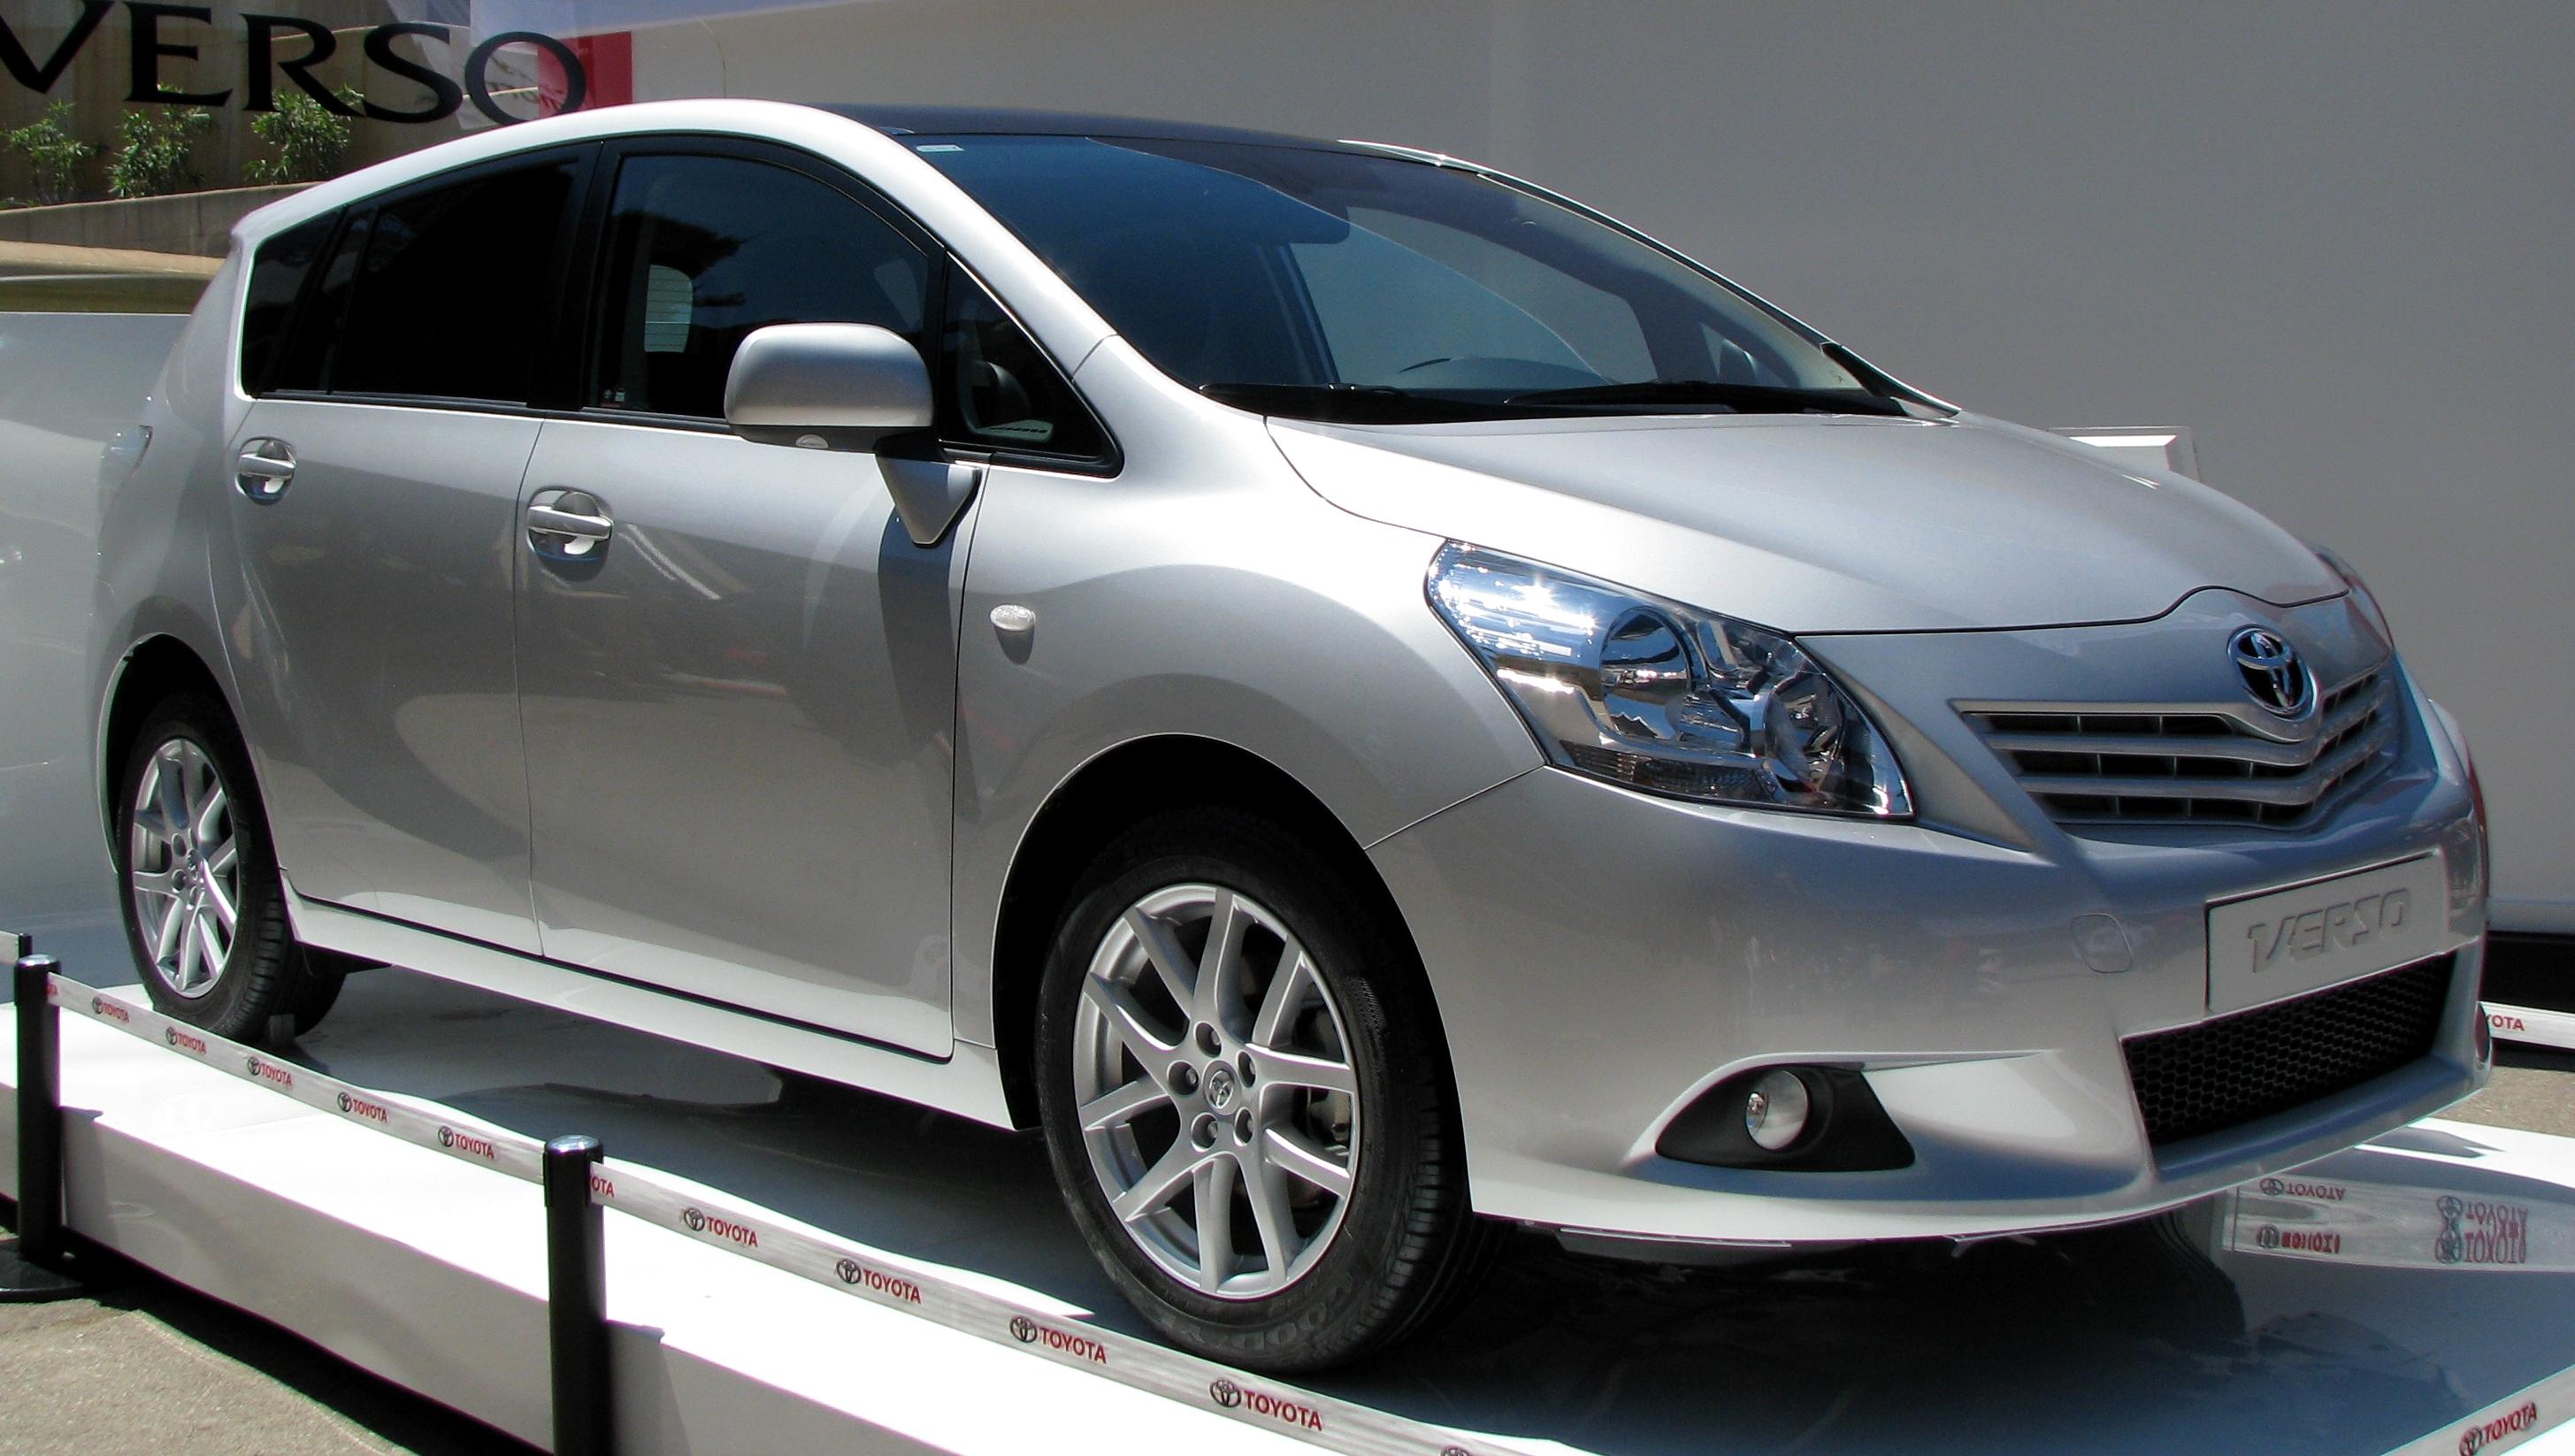 Nissan Albany Ga >> Nissan Versa And Toyota Corolla Reviews | Autos Post